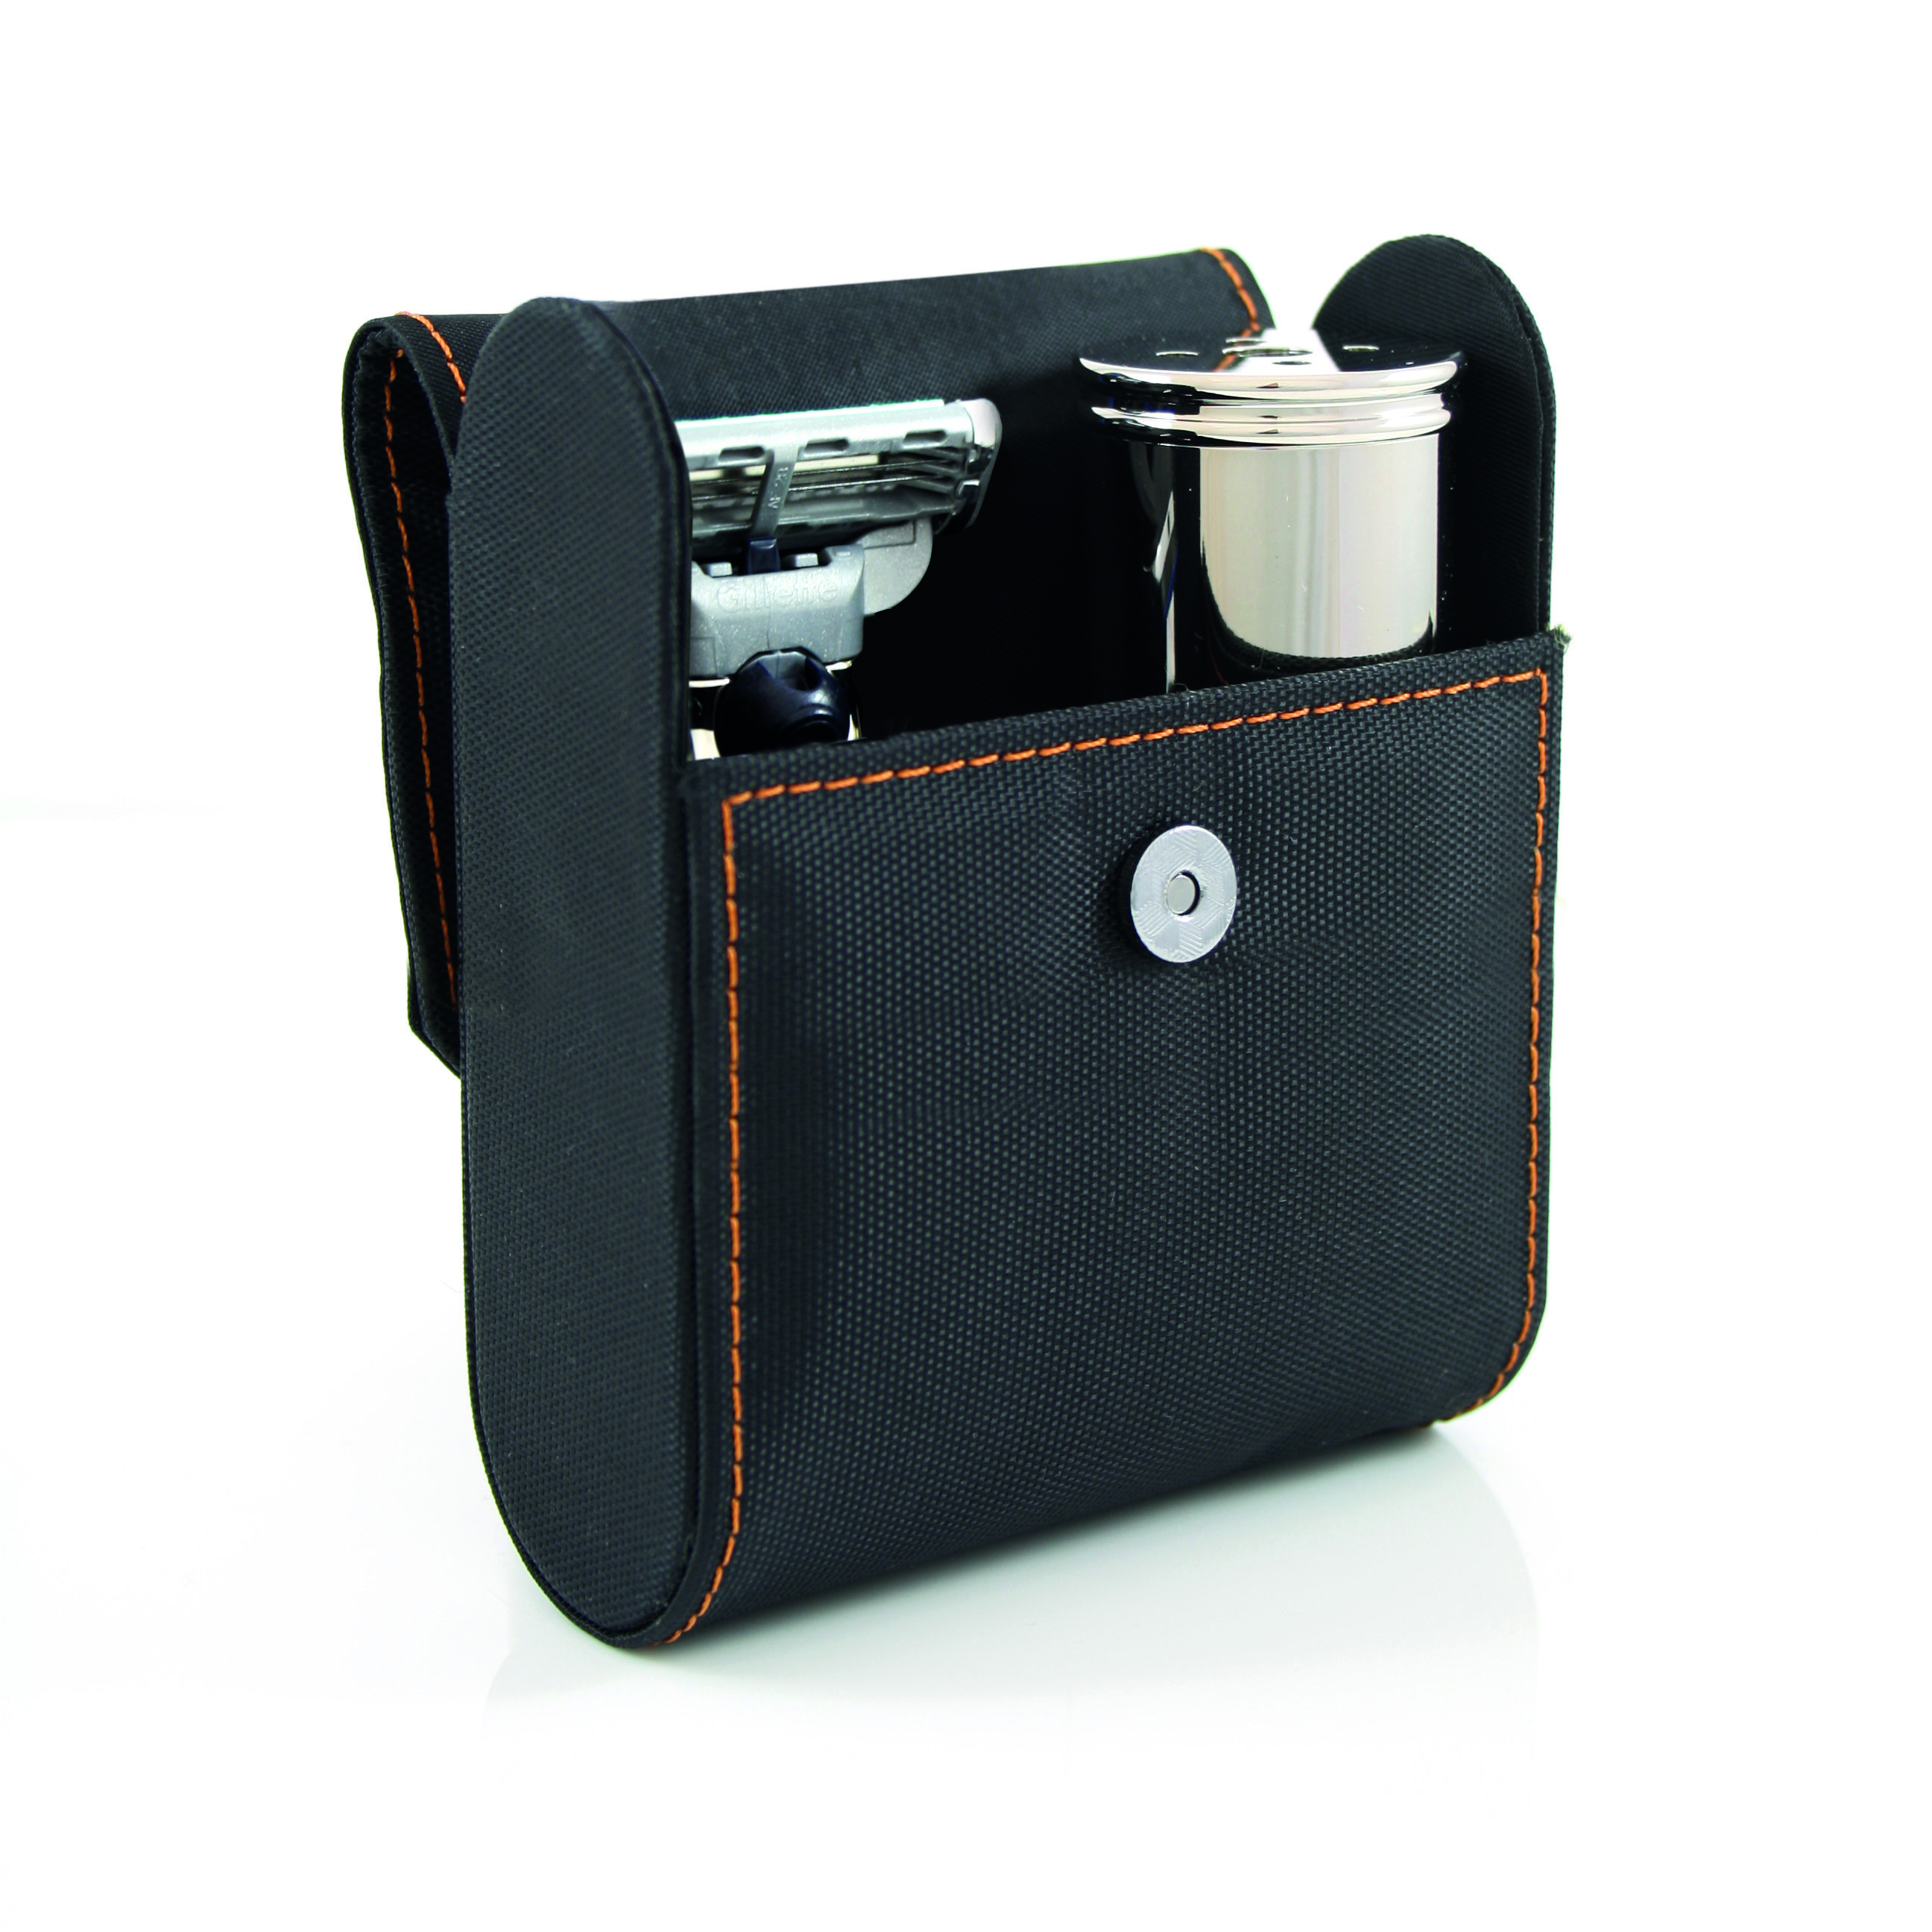 Travel Shaving Kit with Gillette Mach3 Travel Razor RT11M3